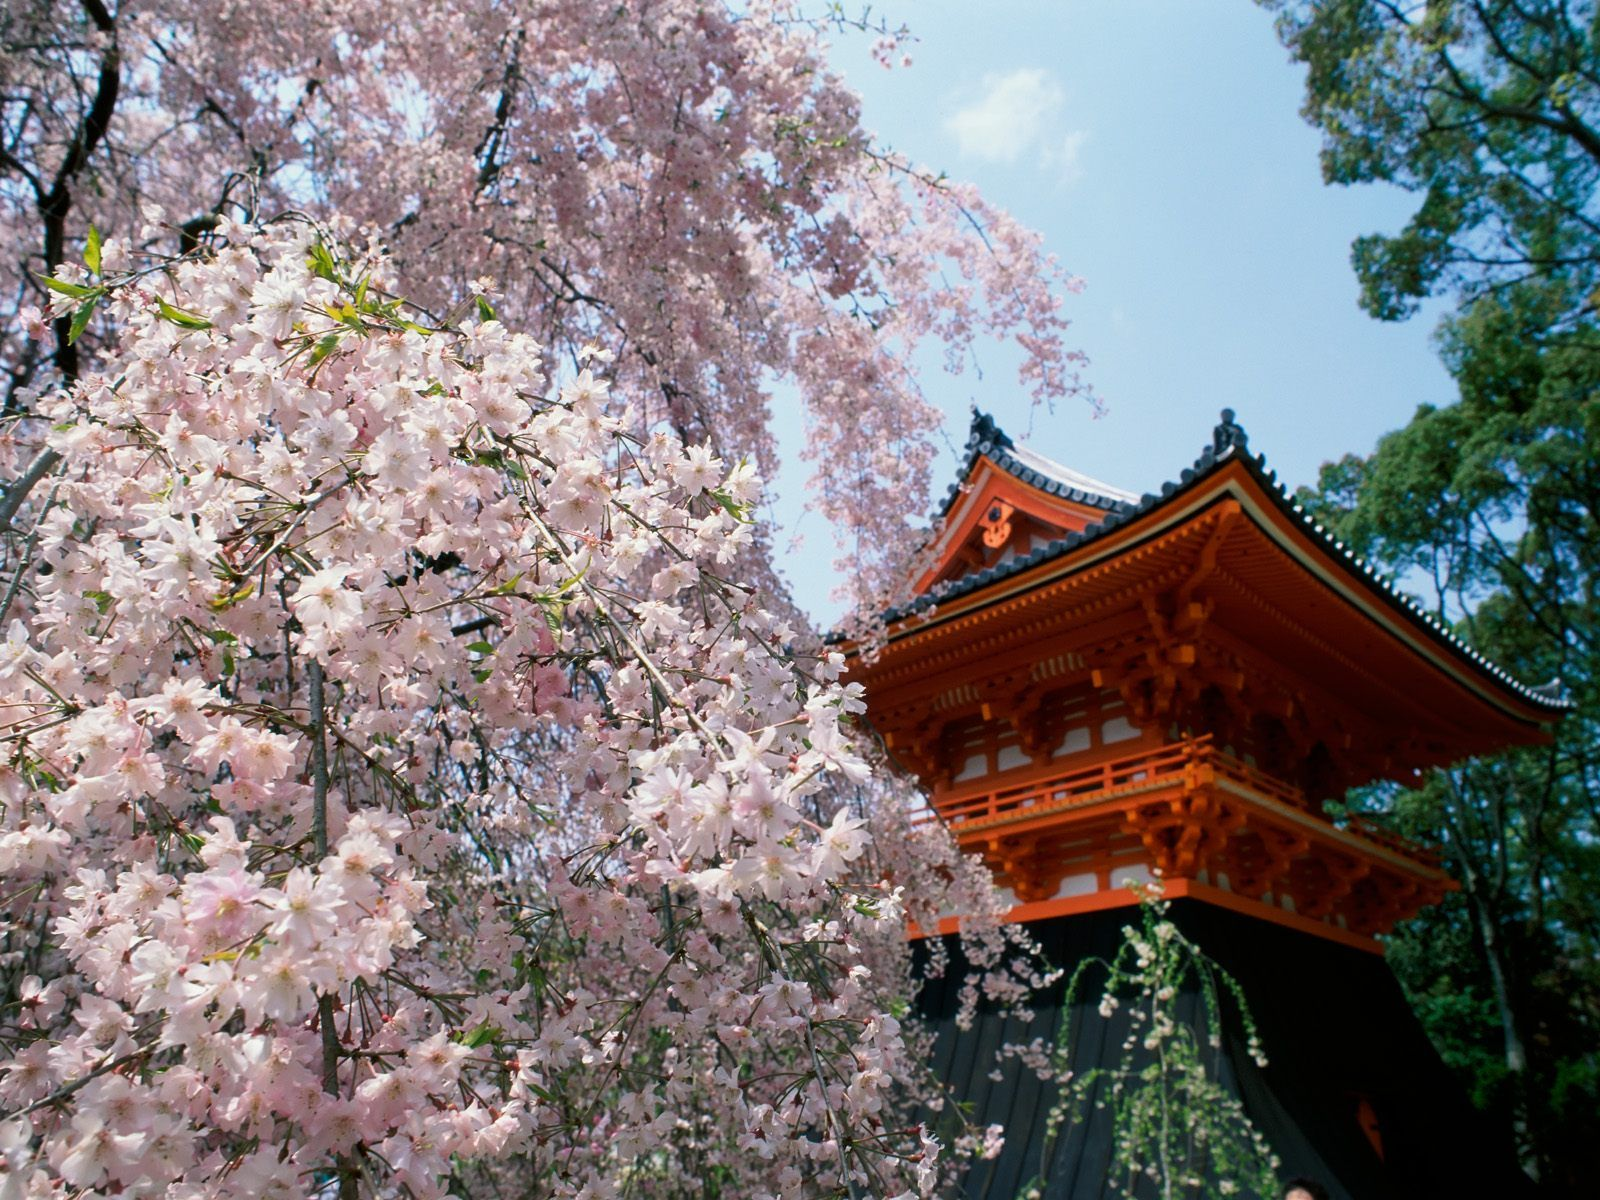 Kyoto Cherry Blossom Guide Sakura Season Viewing Tips Travel Caffeine Japan Travel Cherry Blossom Sakura